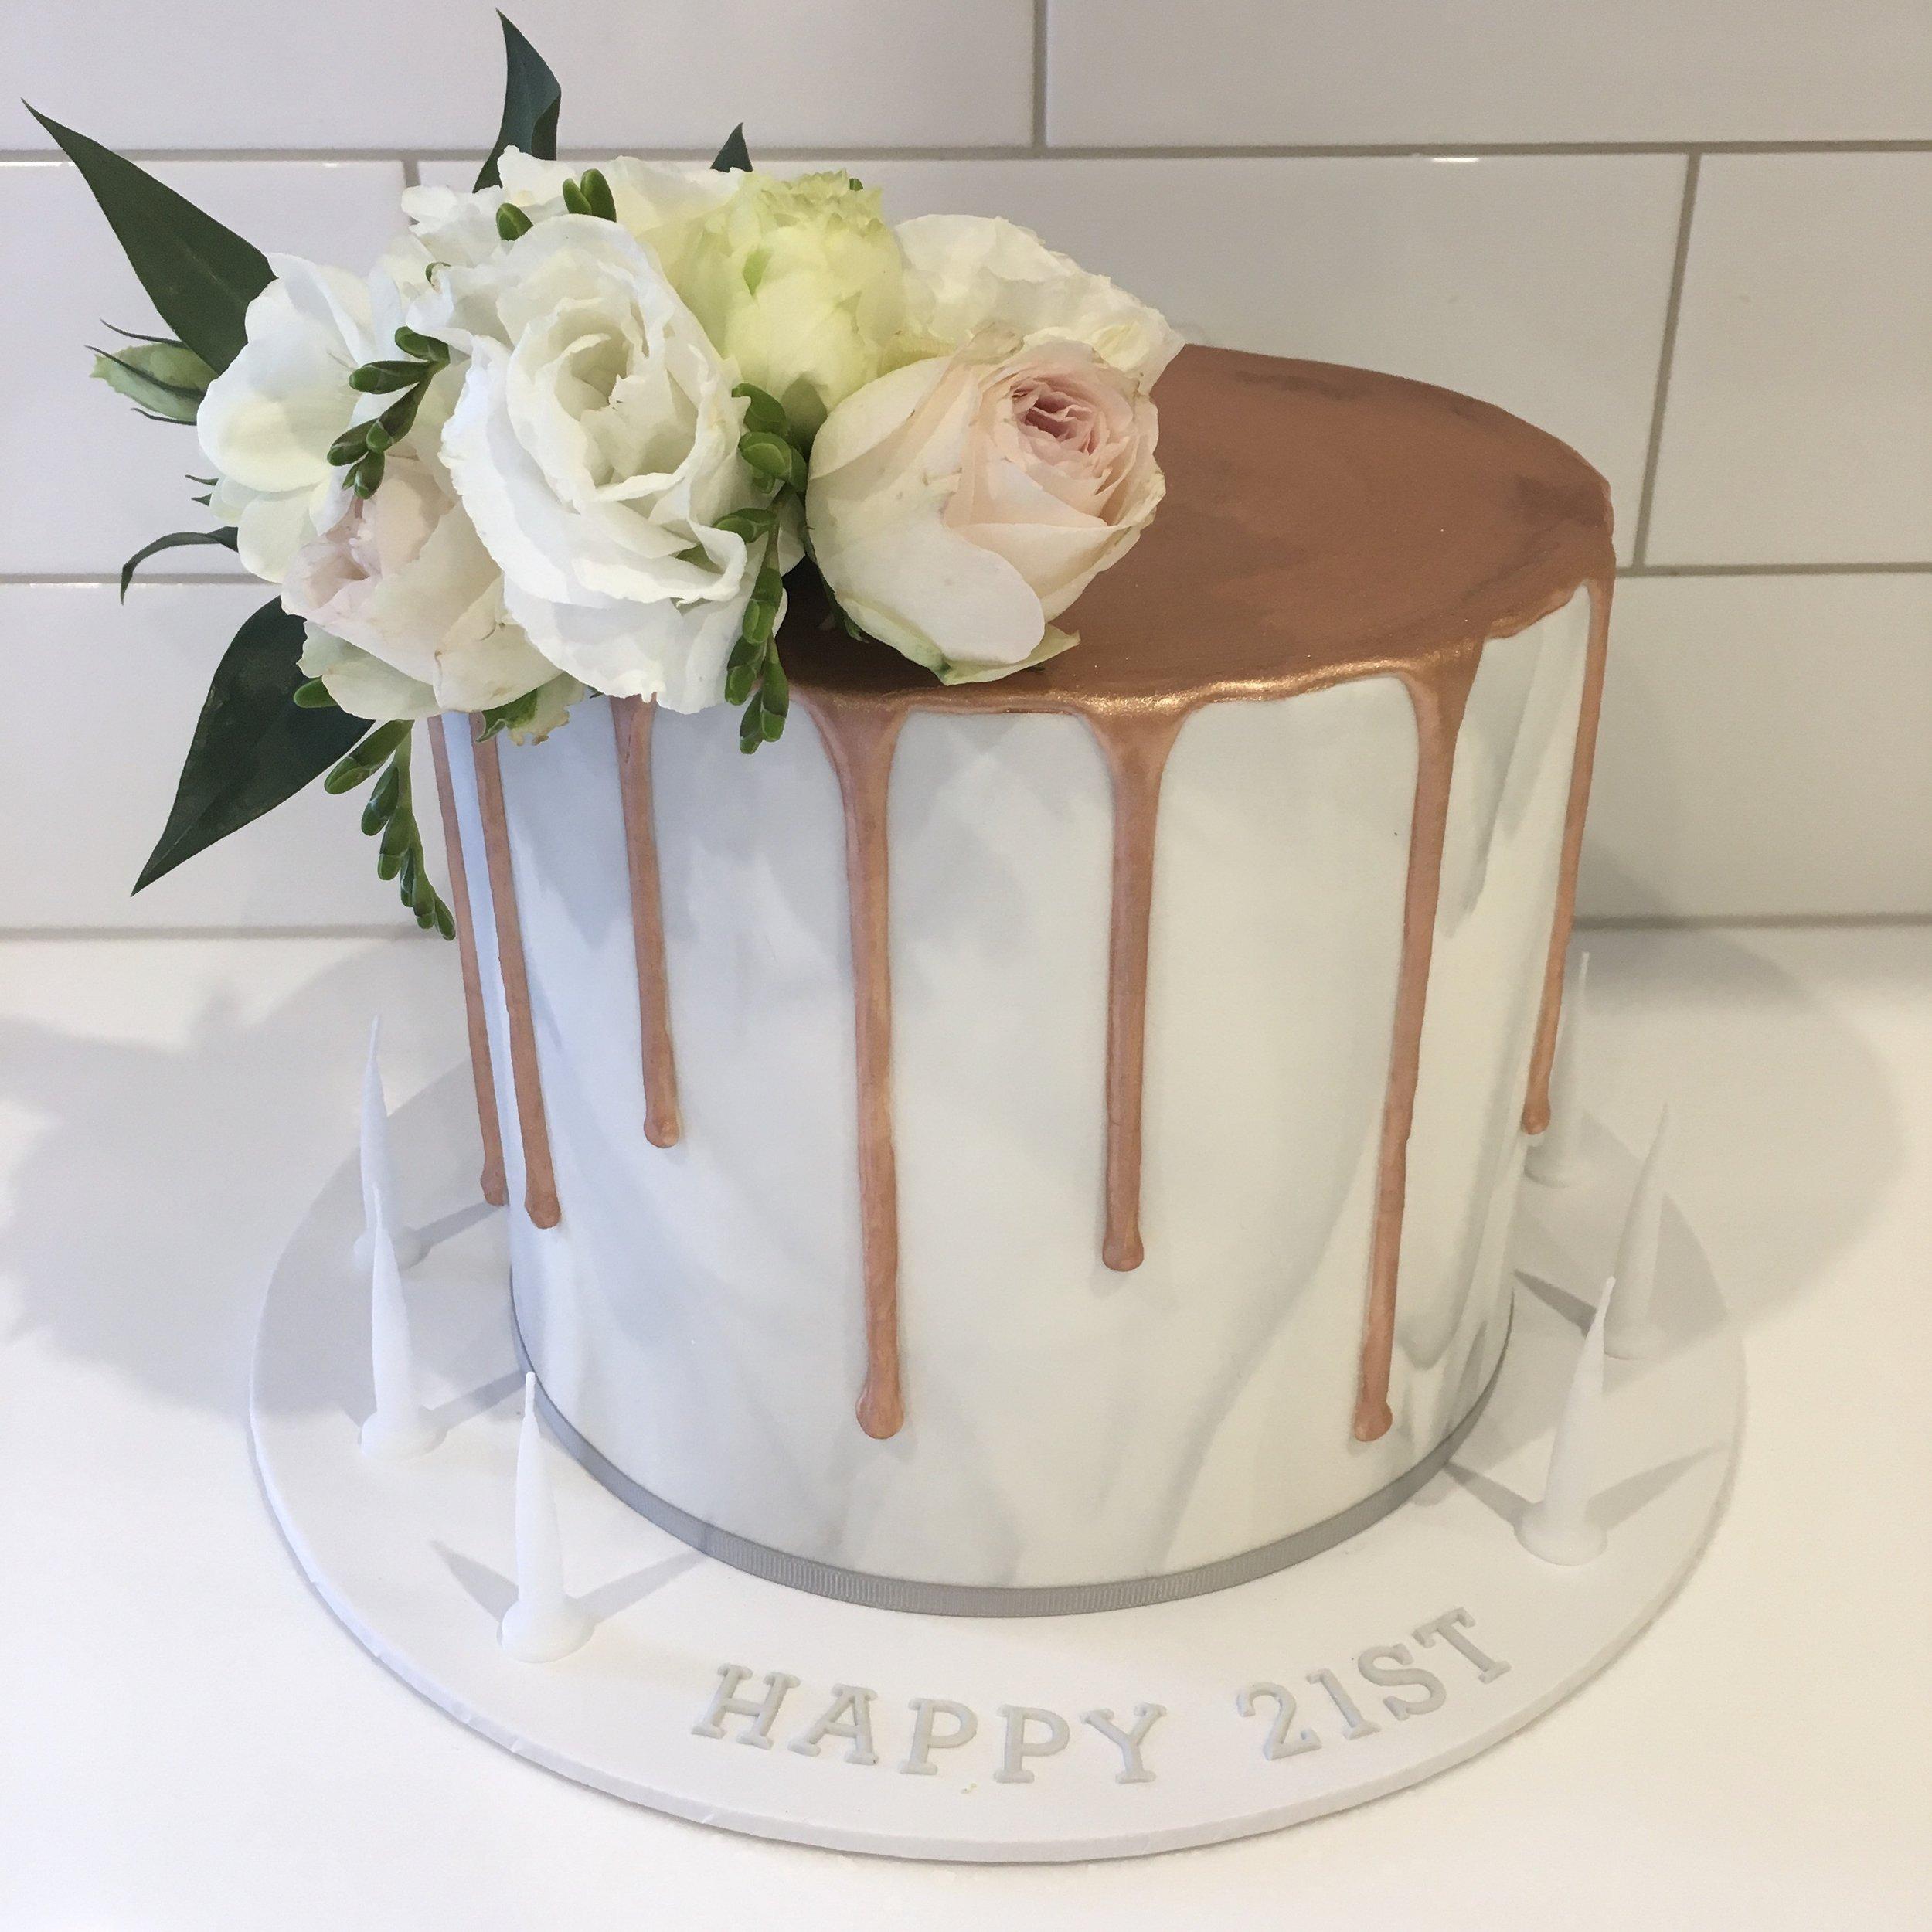 Copper Drip Birthday Cake